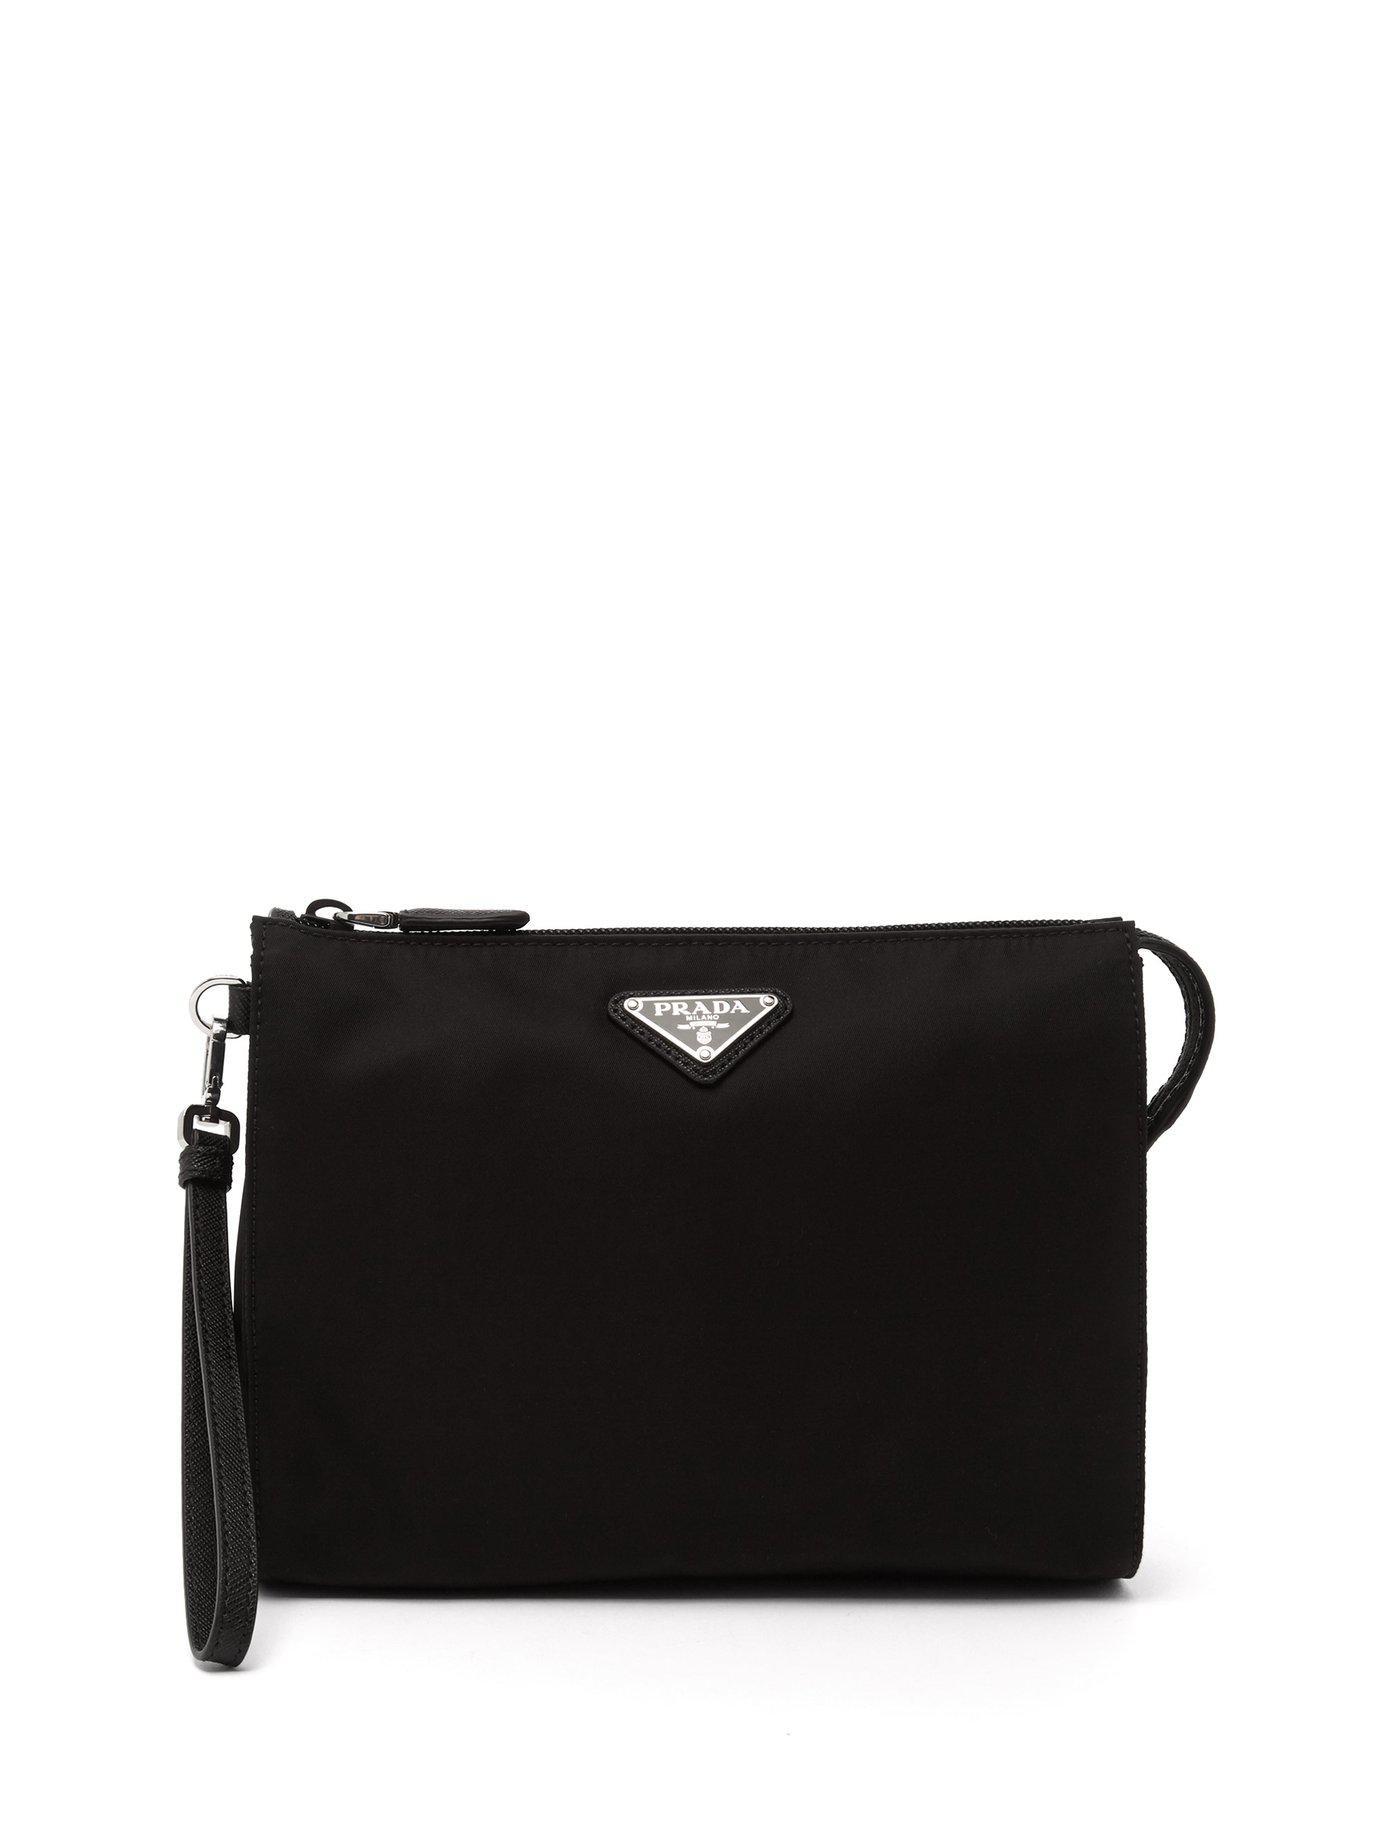 23db7cfabff8 Lyst - Prada Logo Plaque Wash Bag in Black for Men